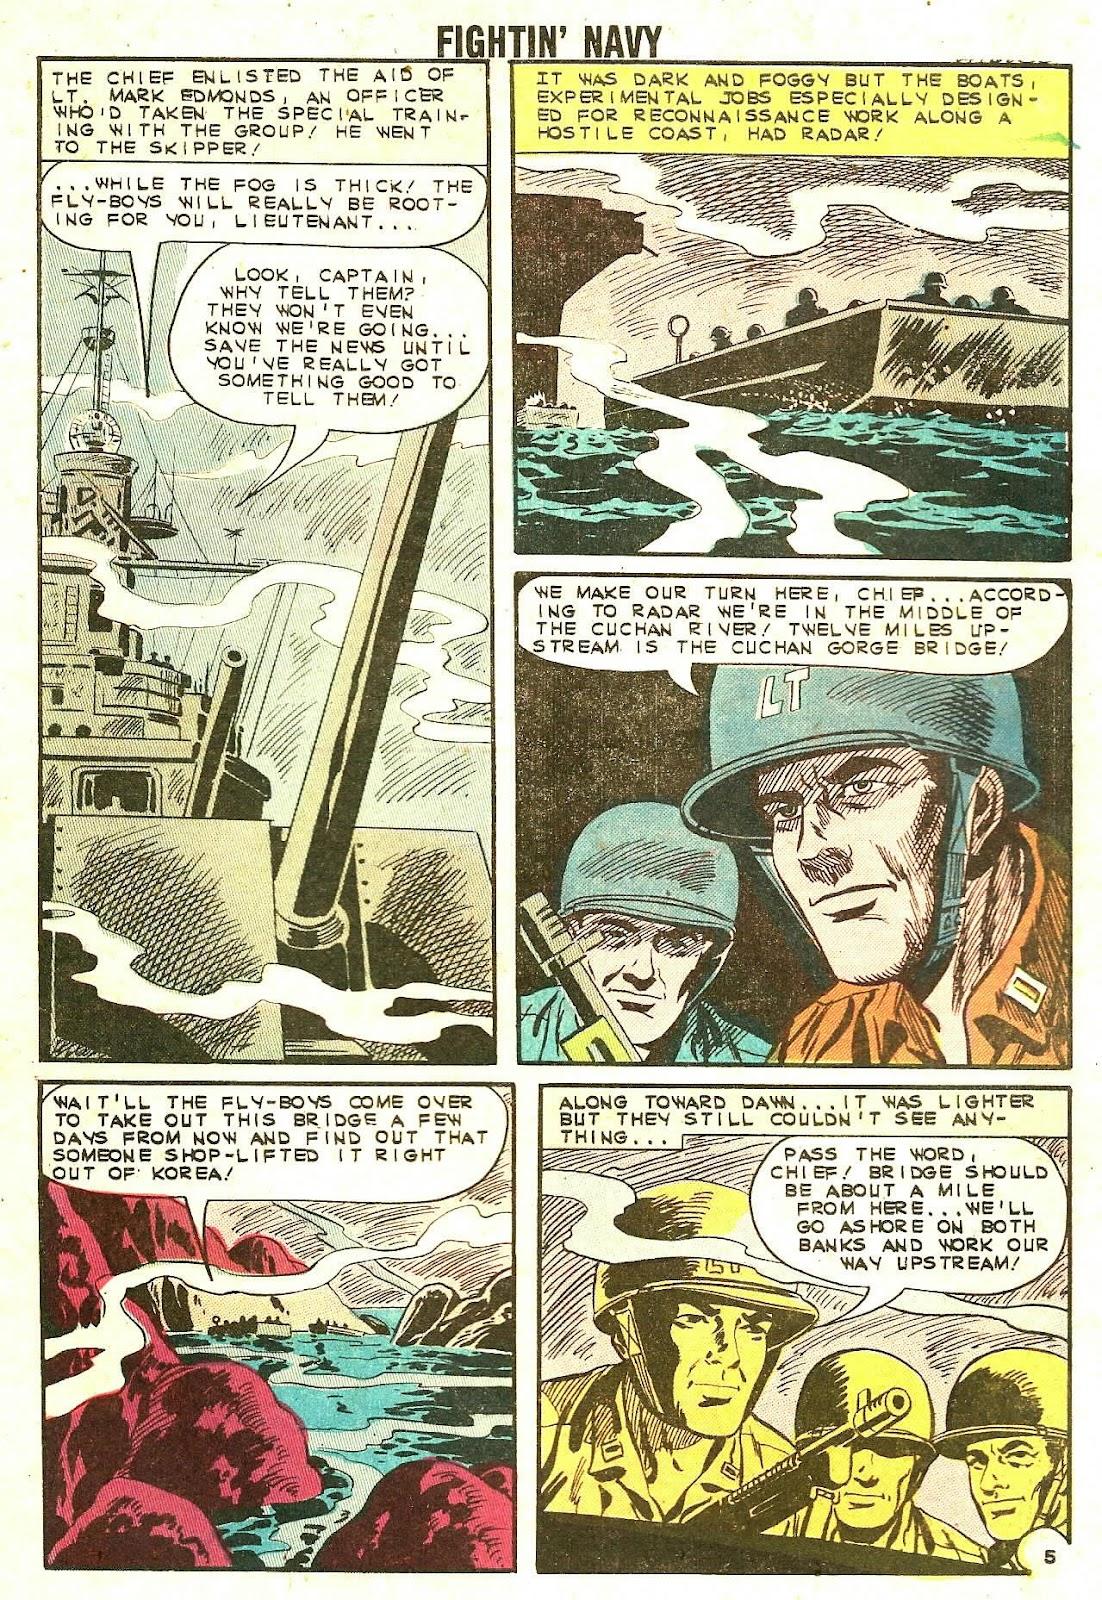 Read online Fightin' Navy comic -  Issue #110 - 32